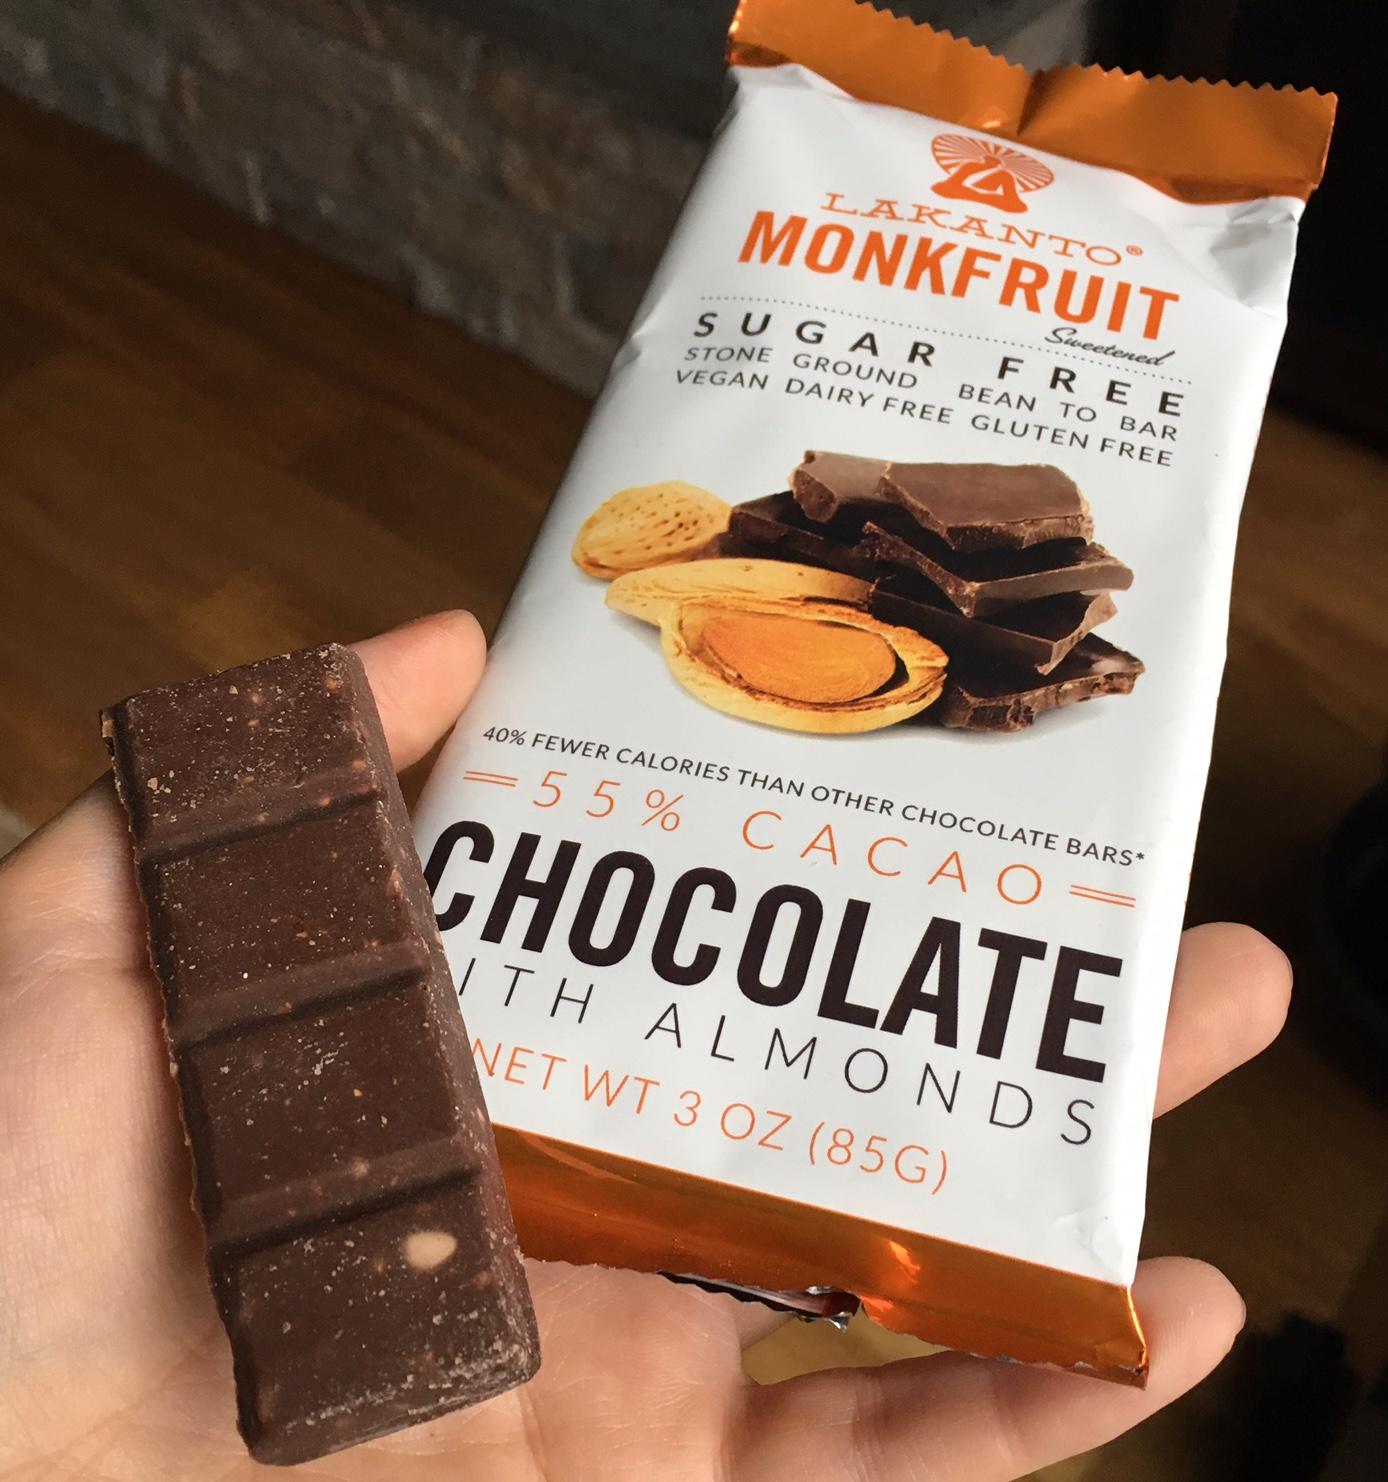 lakanto-chocolate-bar-with-almonds